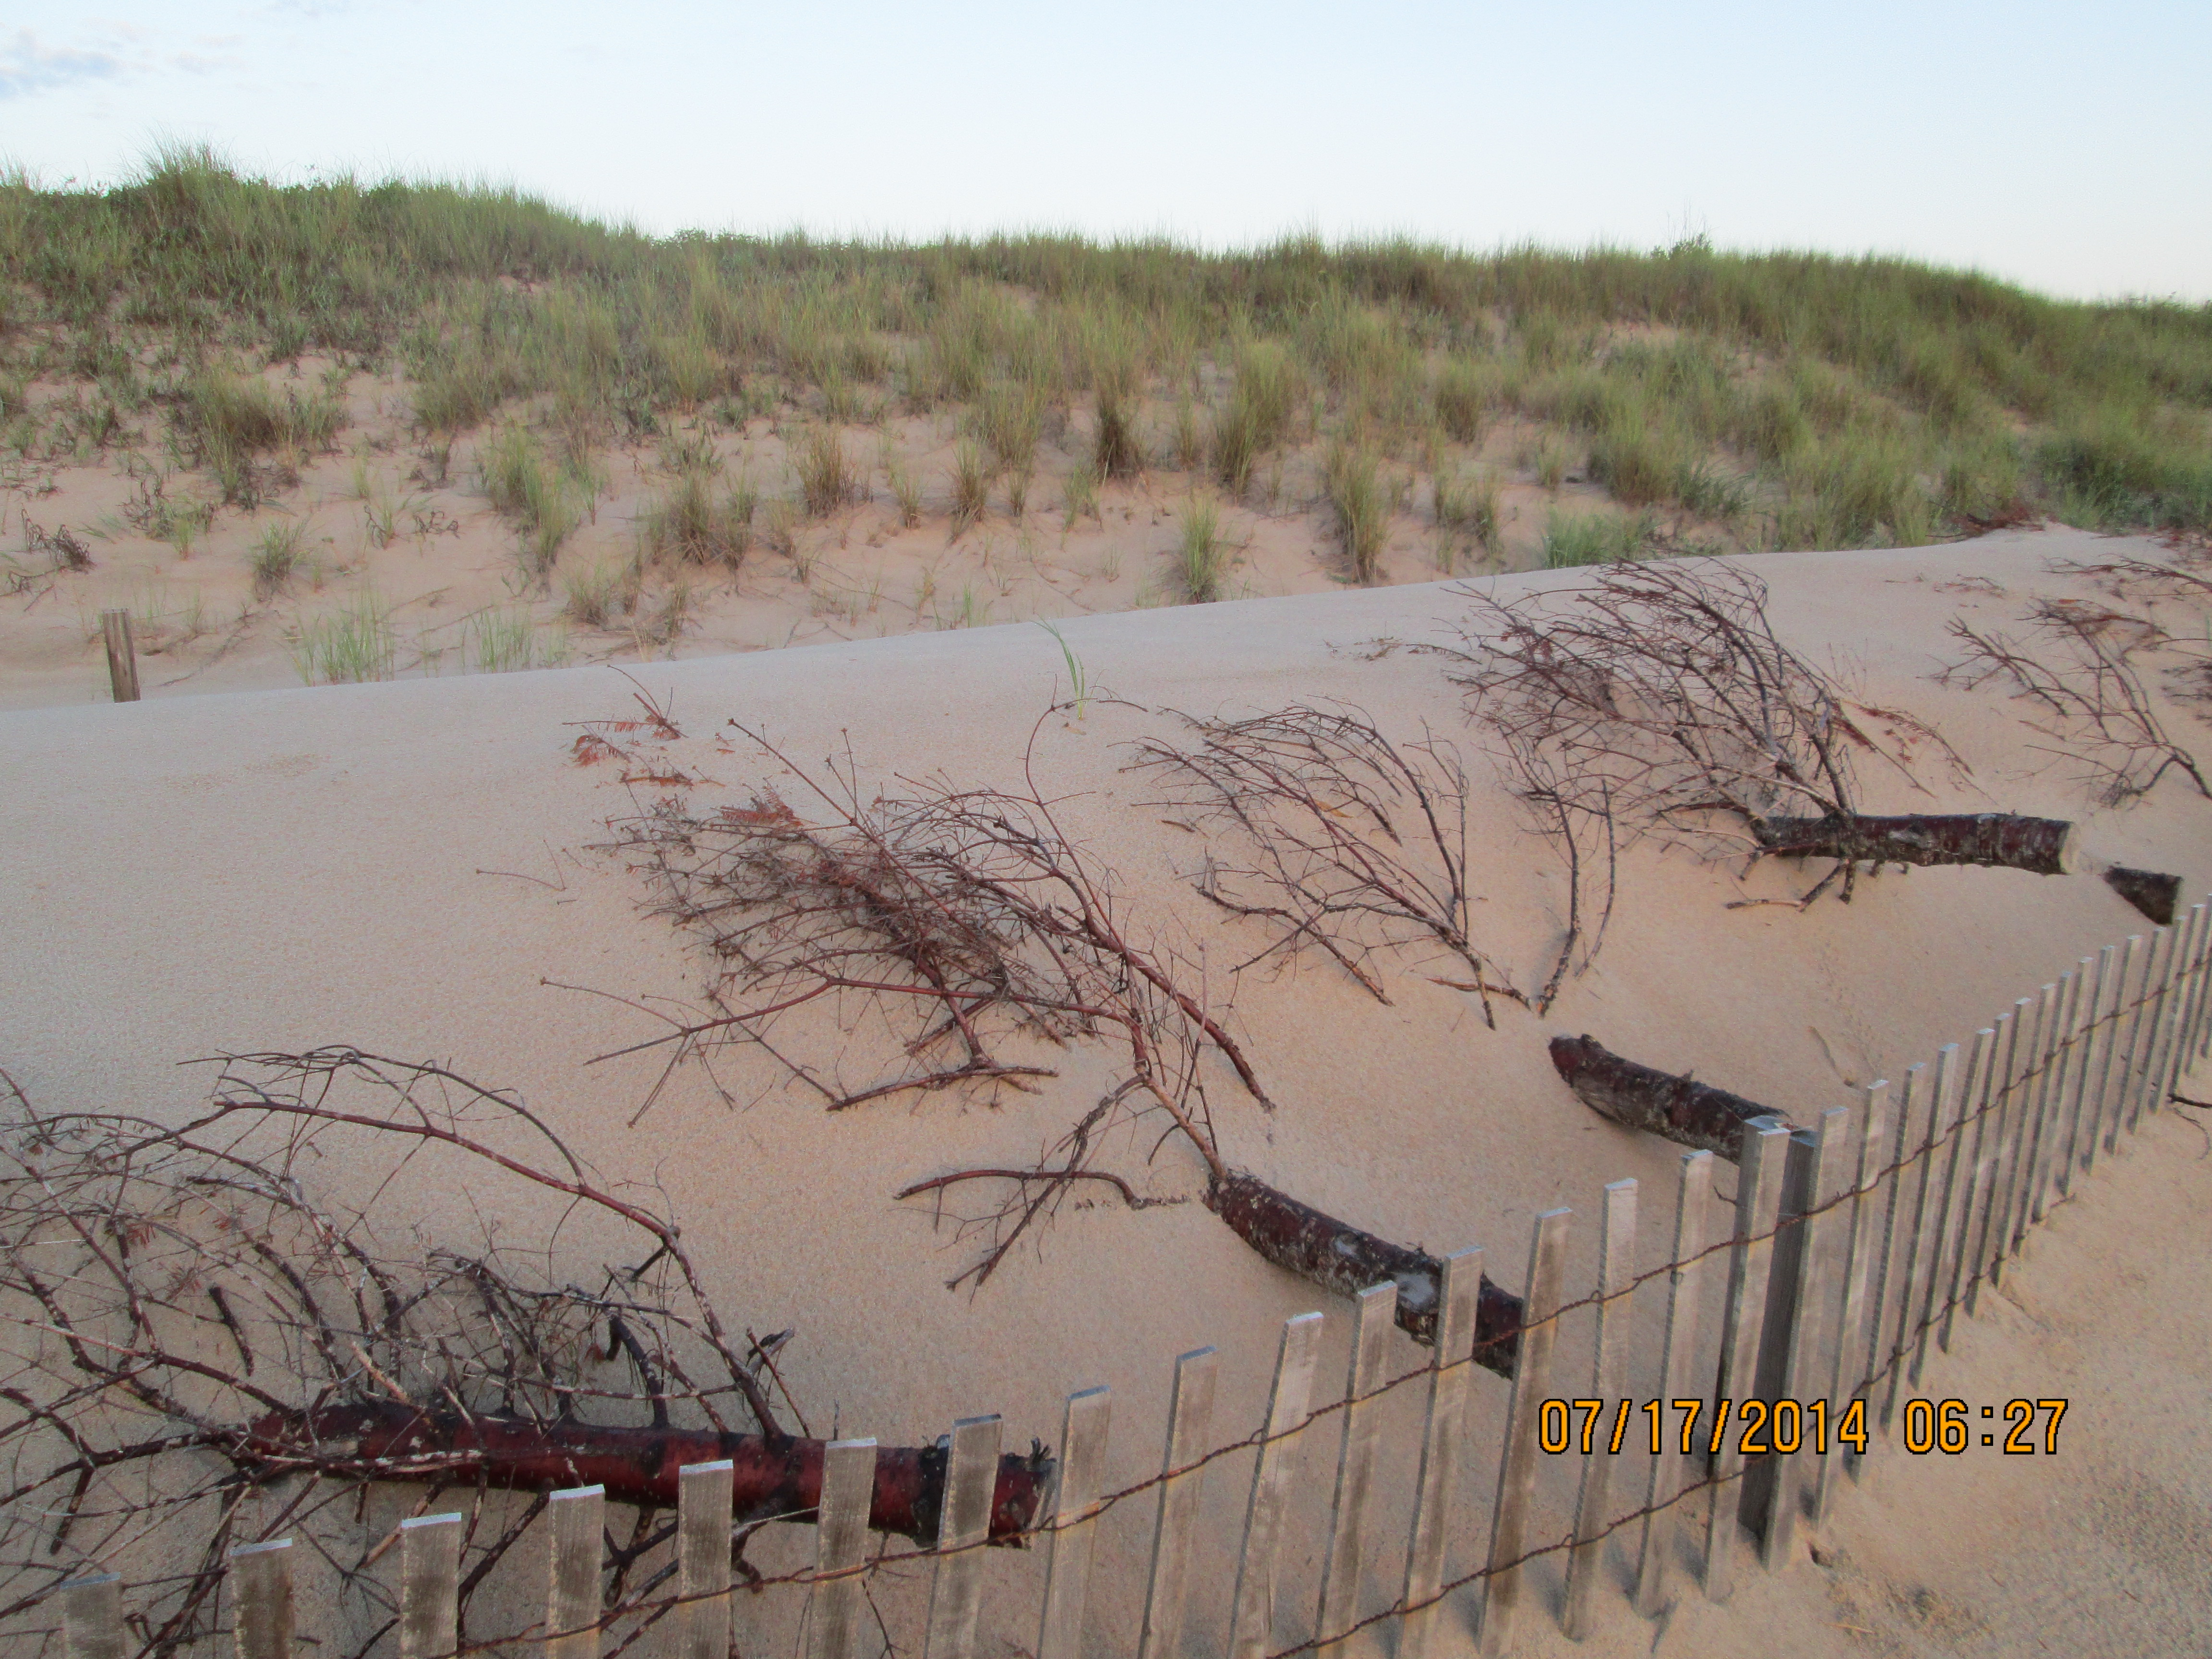 NAS Oceana Sand Dune Restoration planting